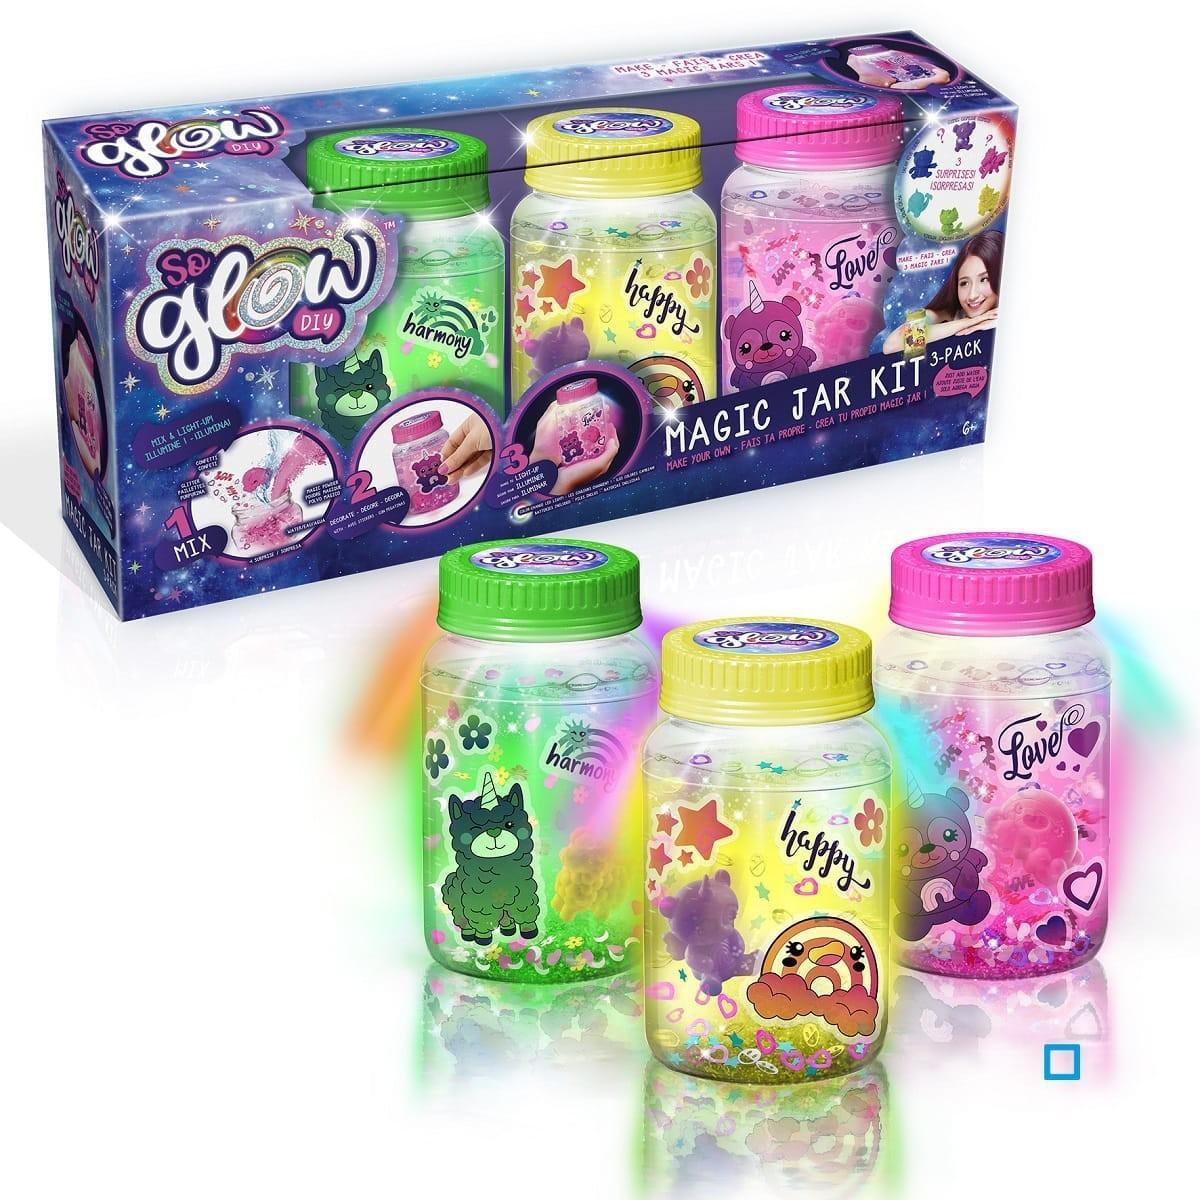 Canal Toys So Glow - Magic Jar Kit